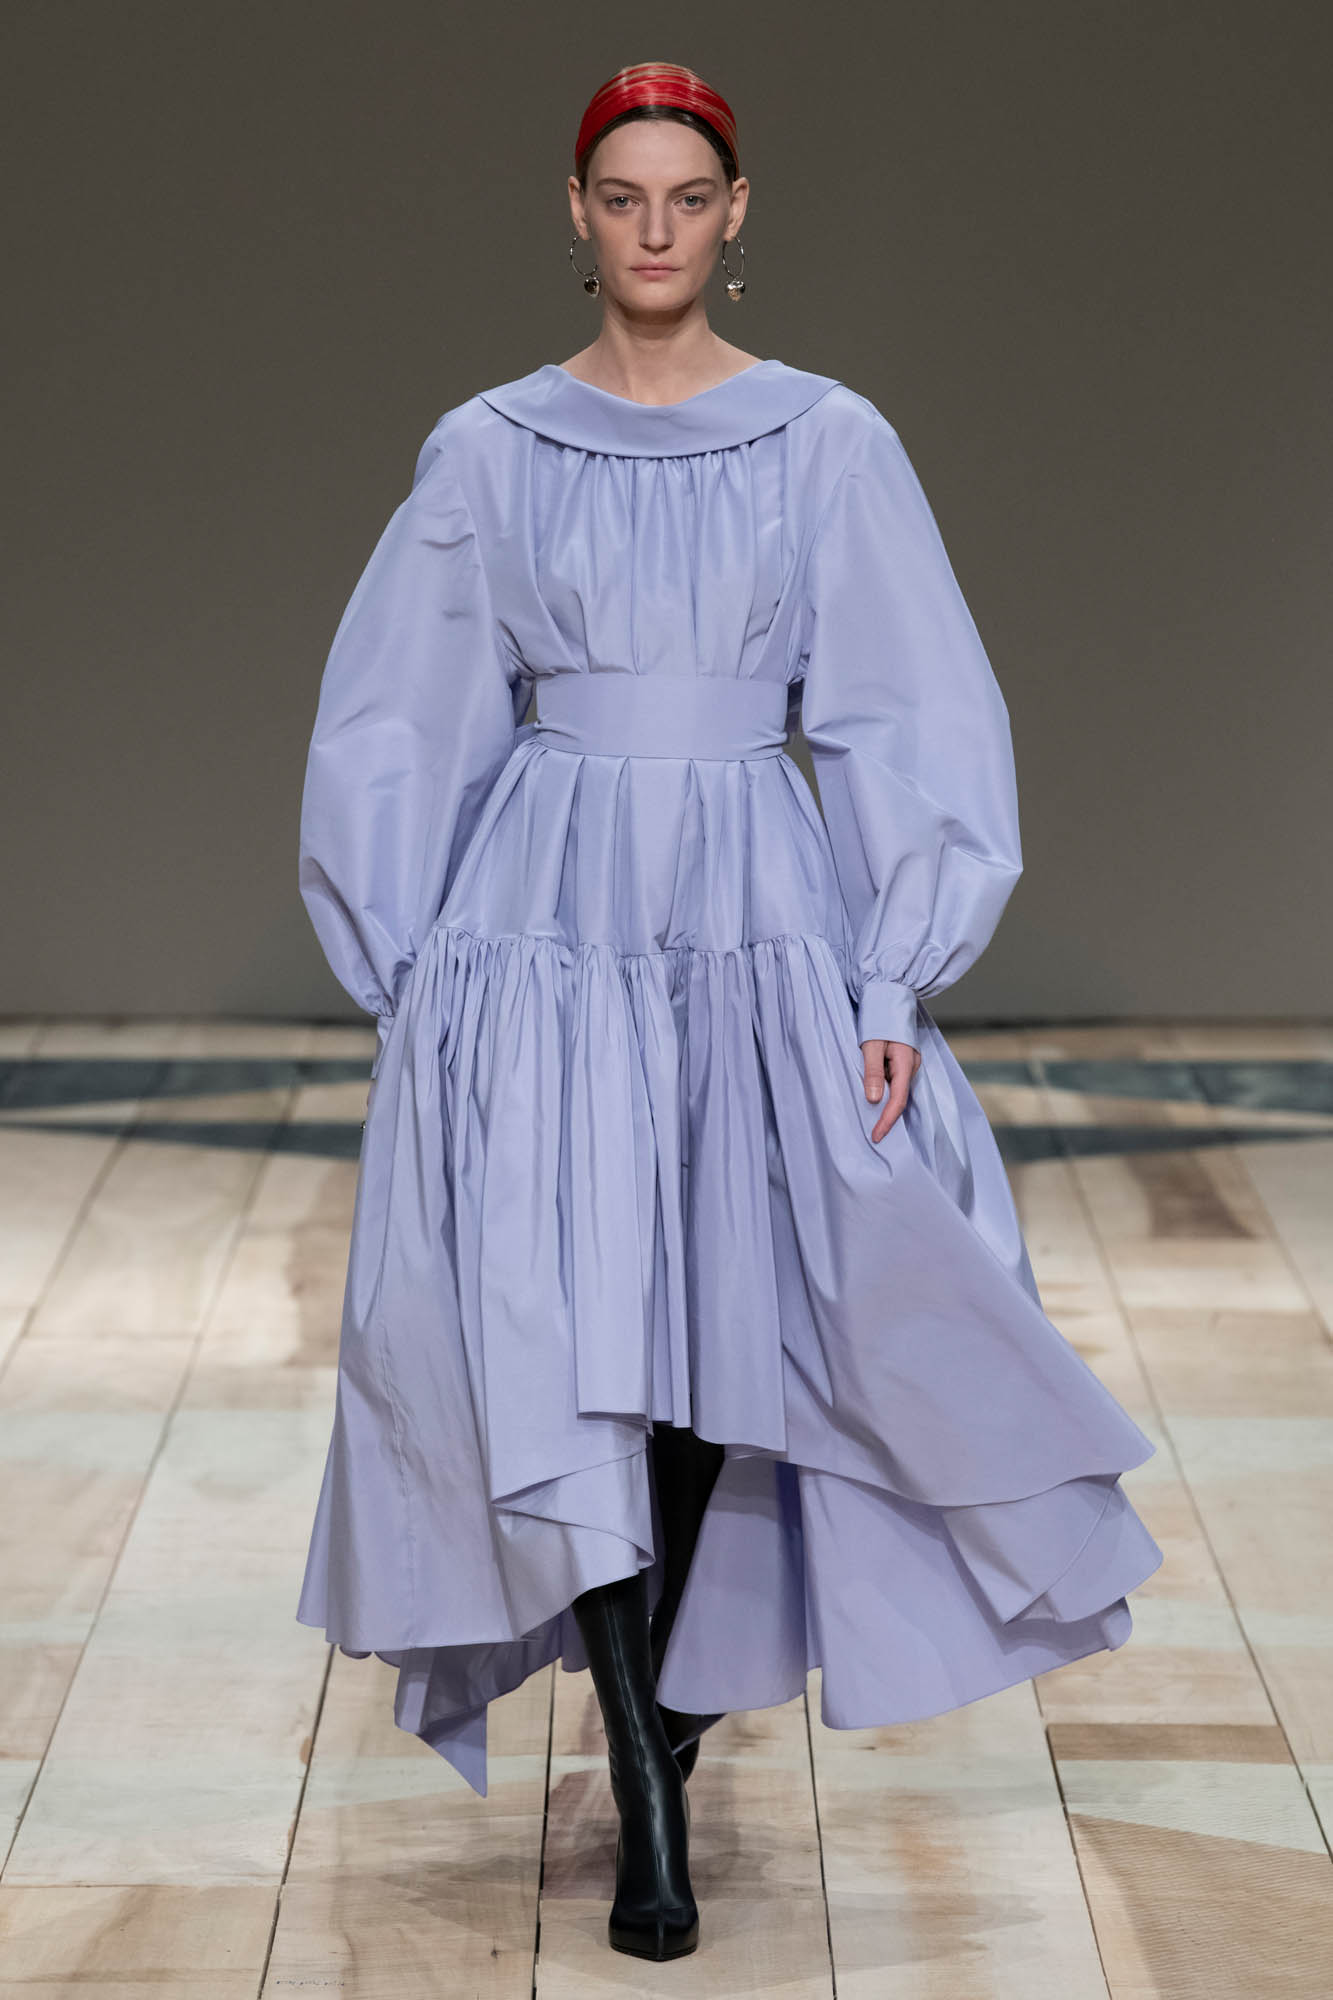 Runway Alexander McQueen Fall Winter 2020 Women's Collection Paris Fashion Week